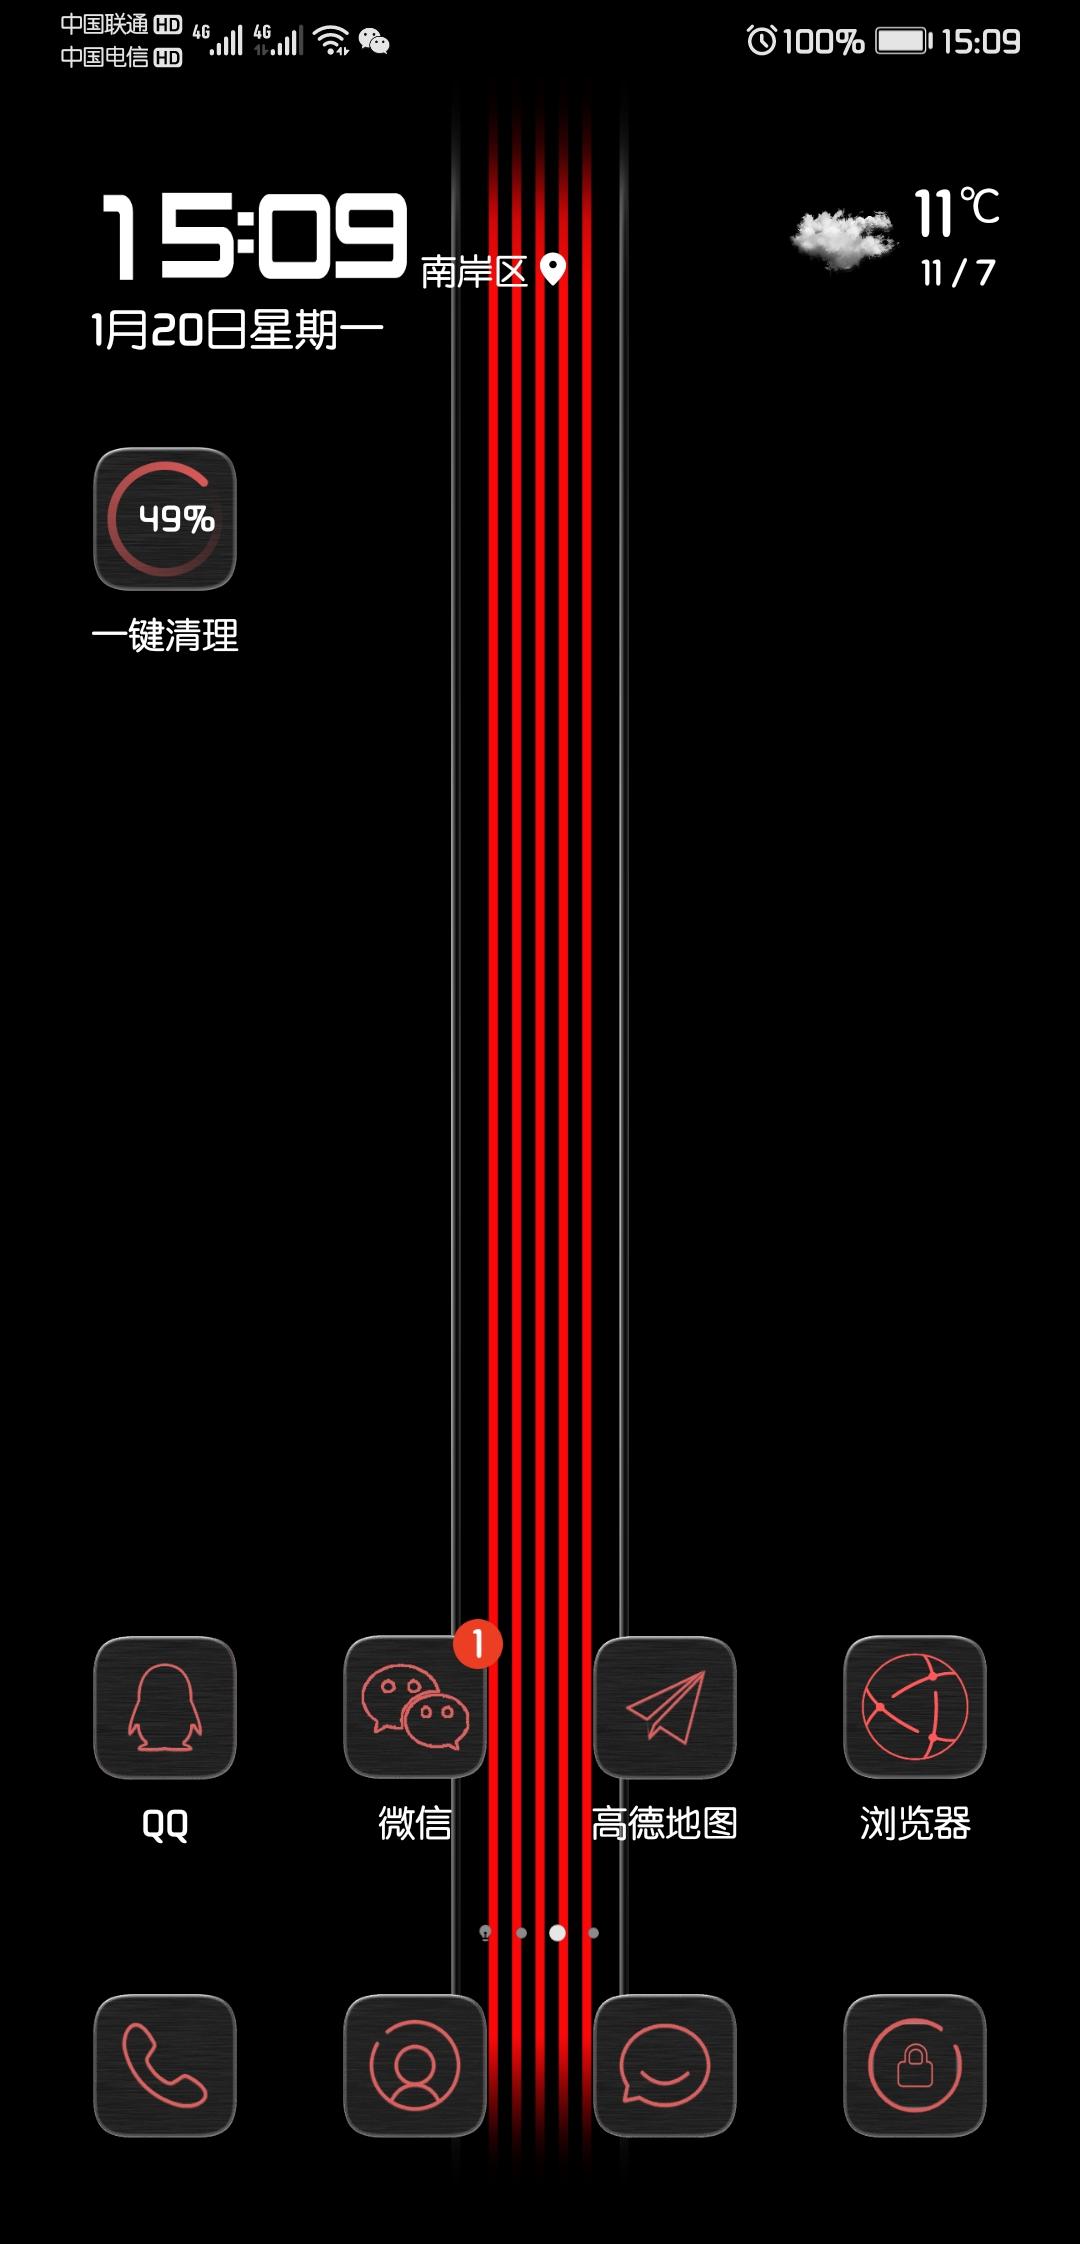 Screenshot_20200120_150944_com.huawei.android.lau.jpg